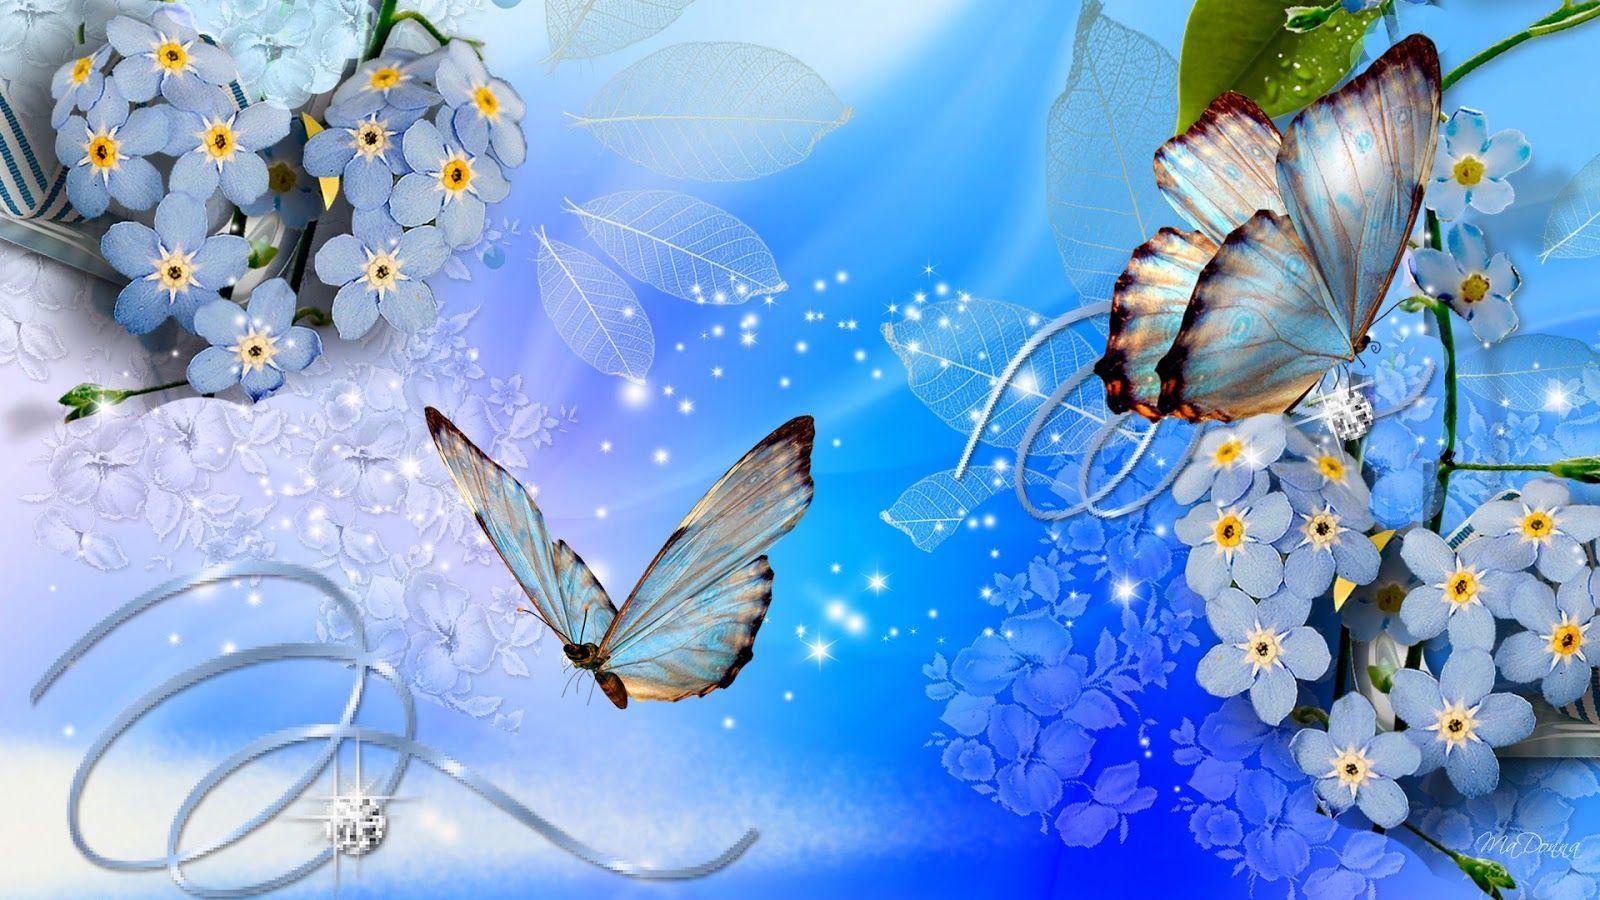 Blue Butterflies Blue Flowers Wallpaper Download Beautiful Flower Wallpaper Blue Flower Wallpaper Butterfly Wallpaper